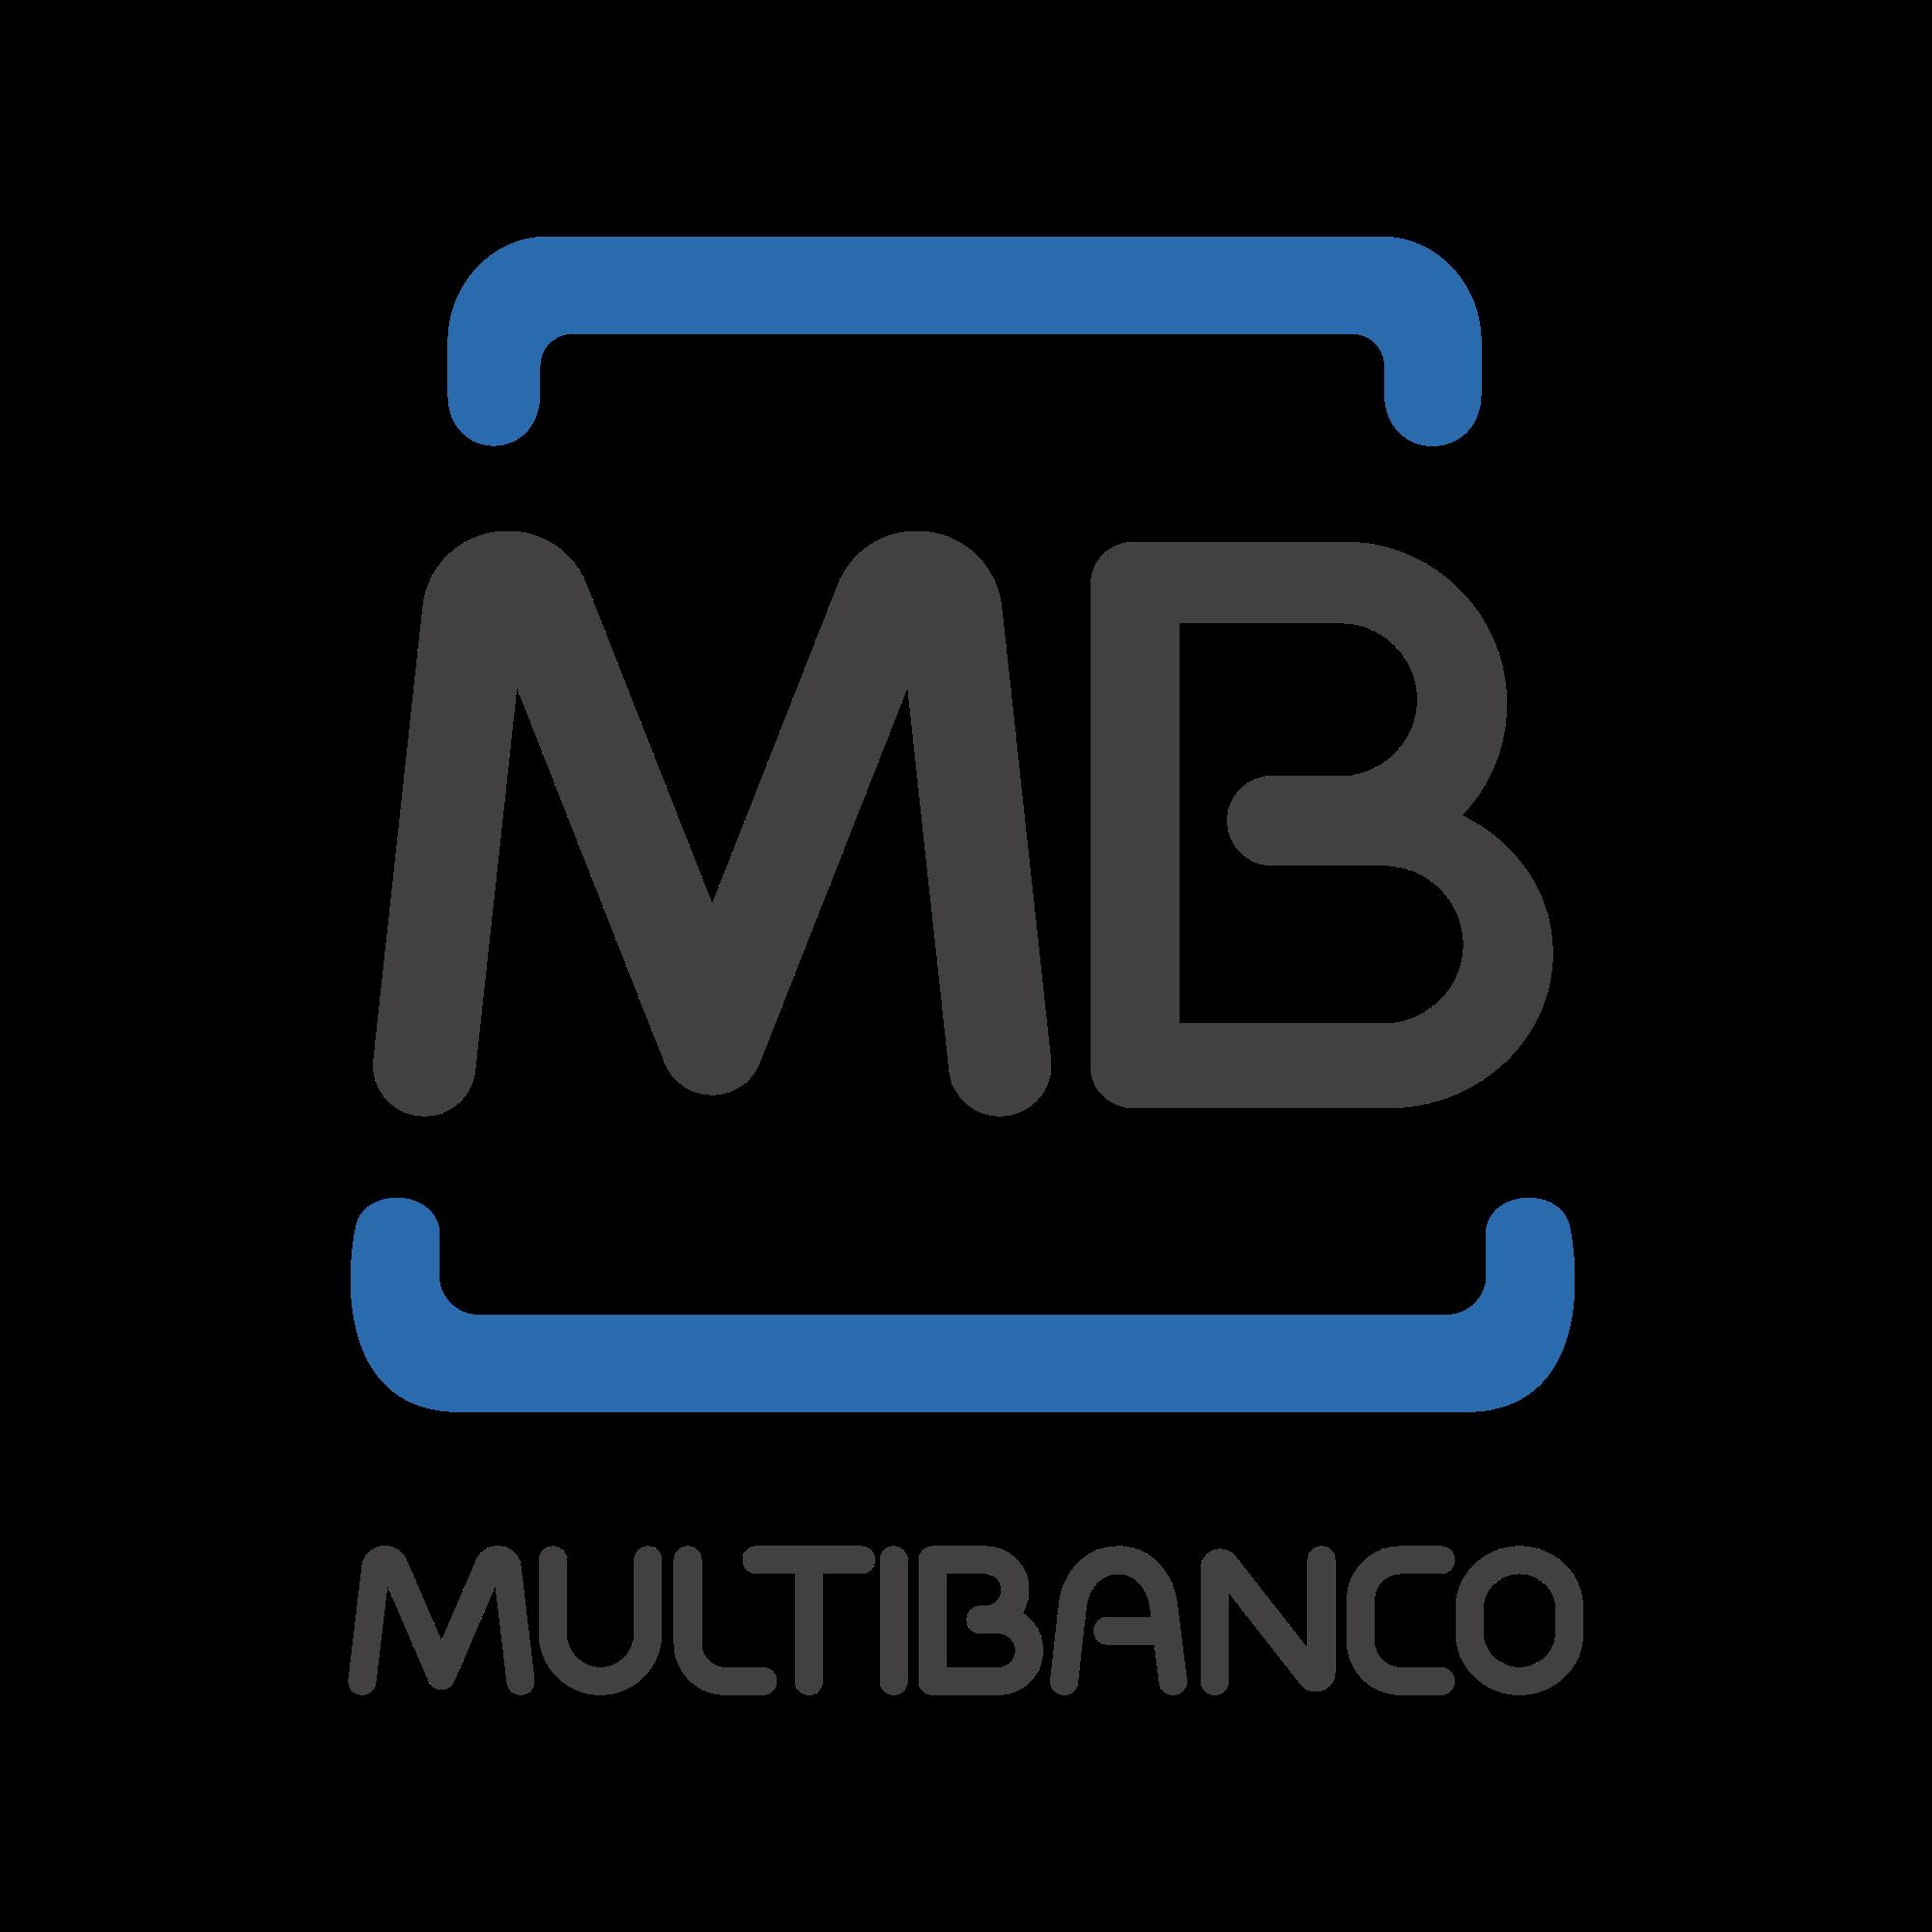 Multibanco-logo